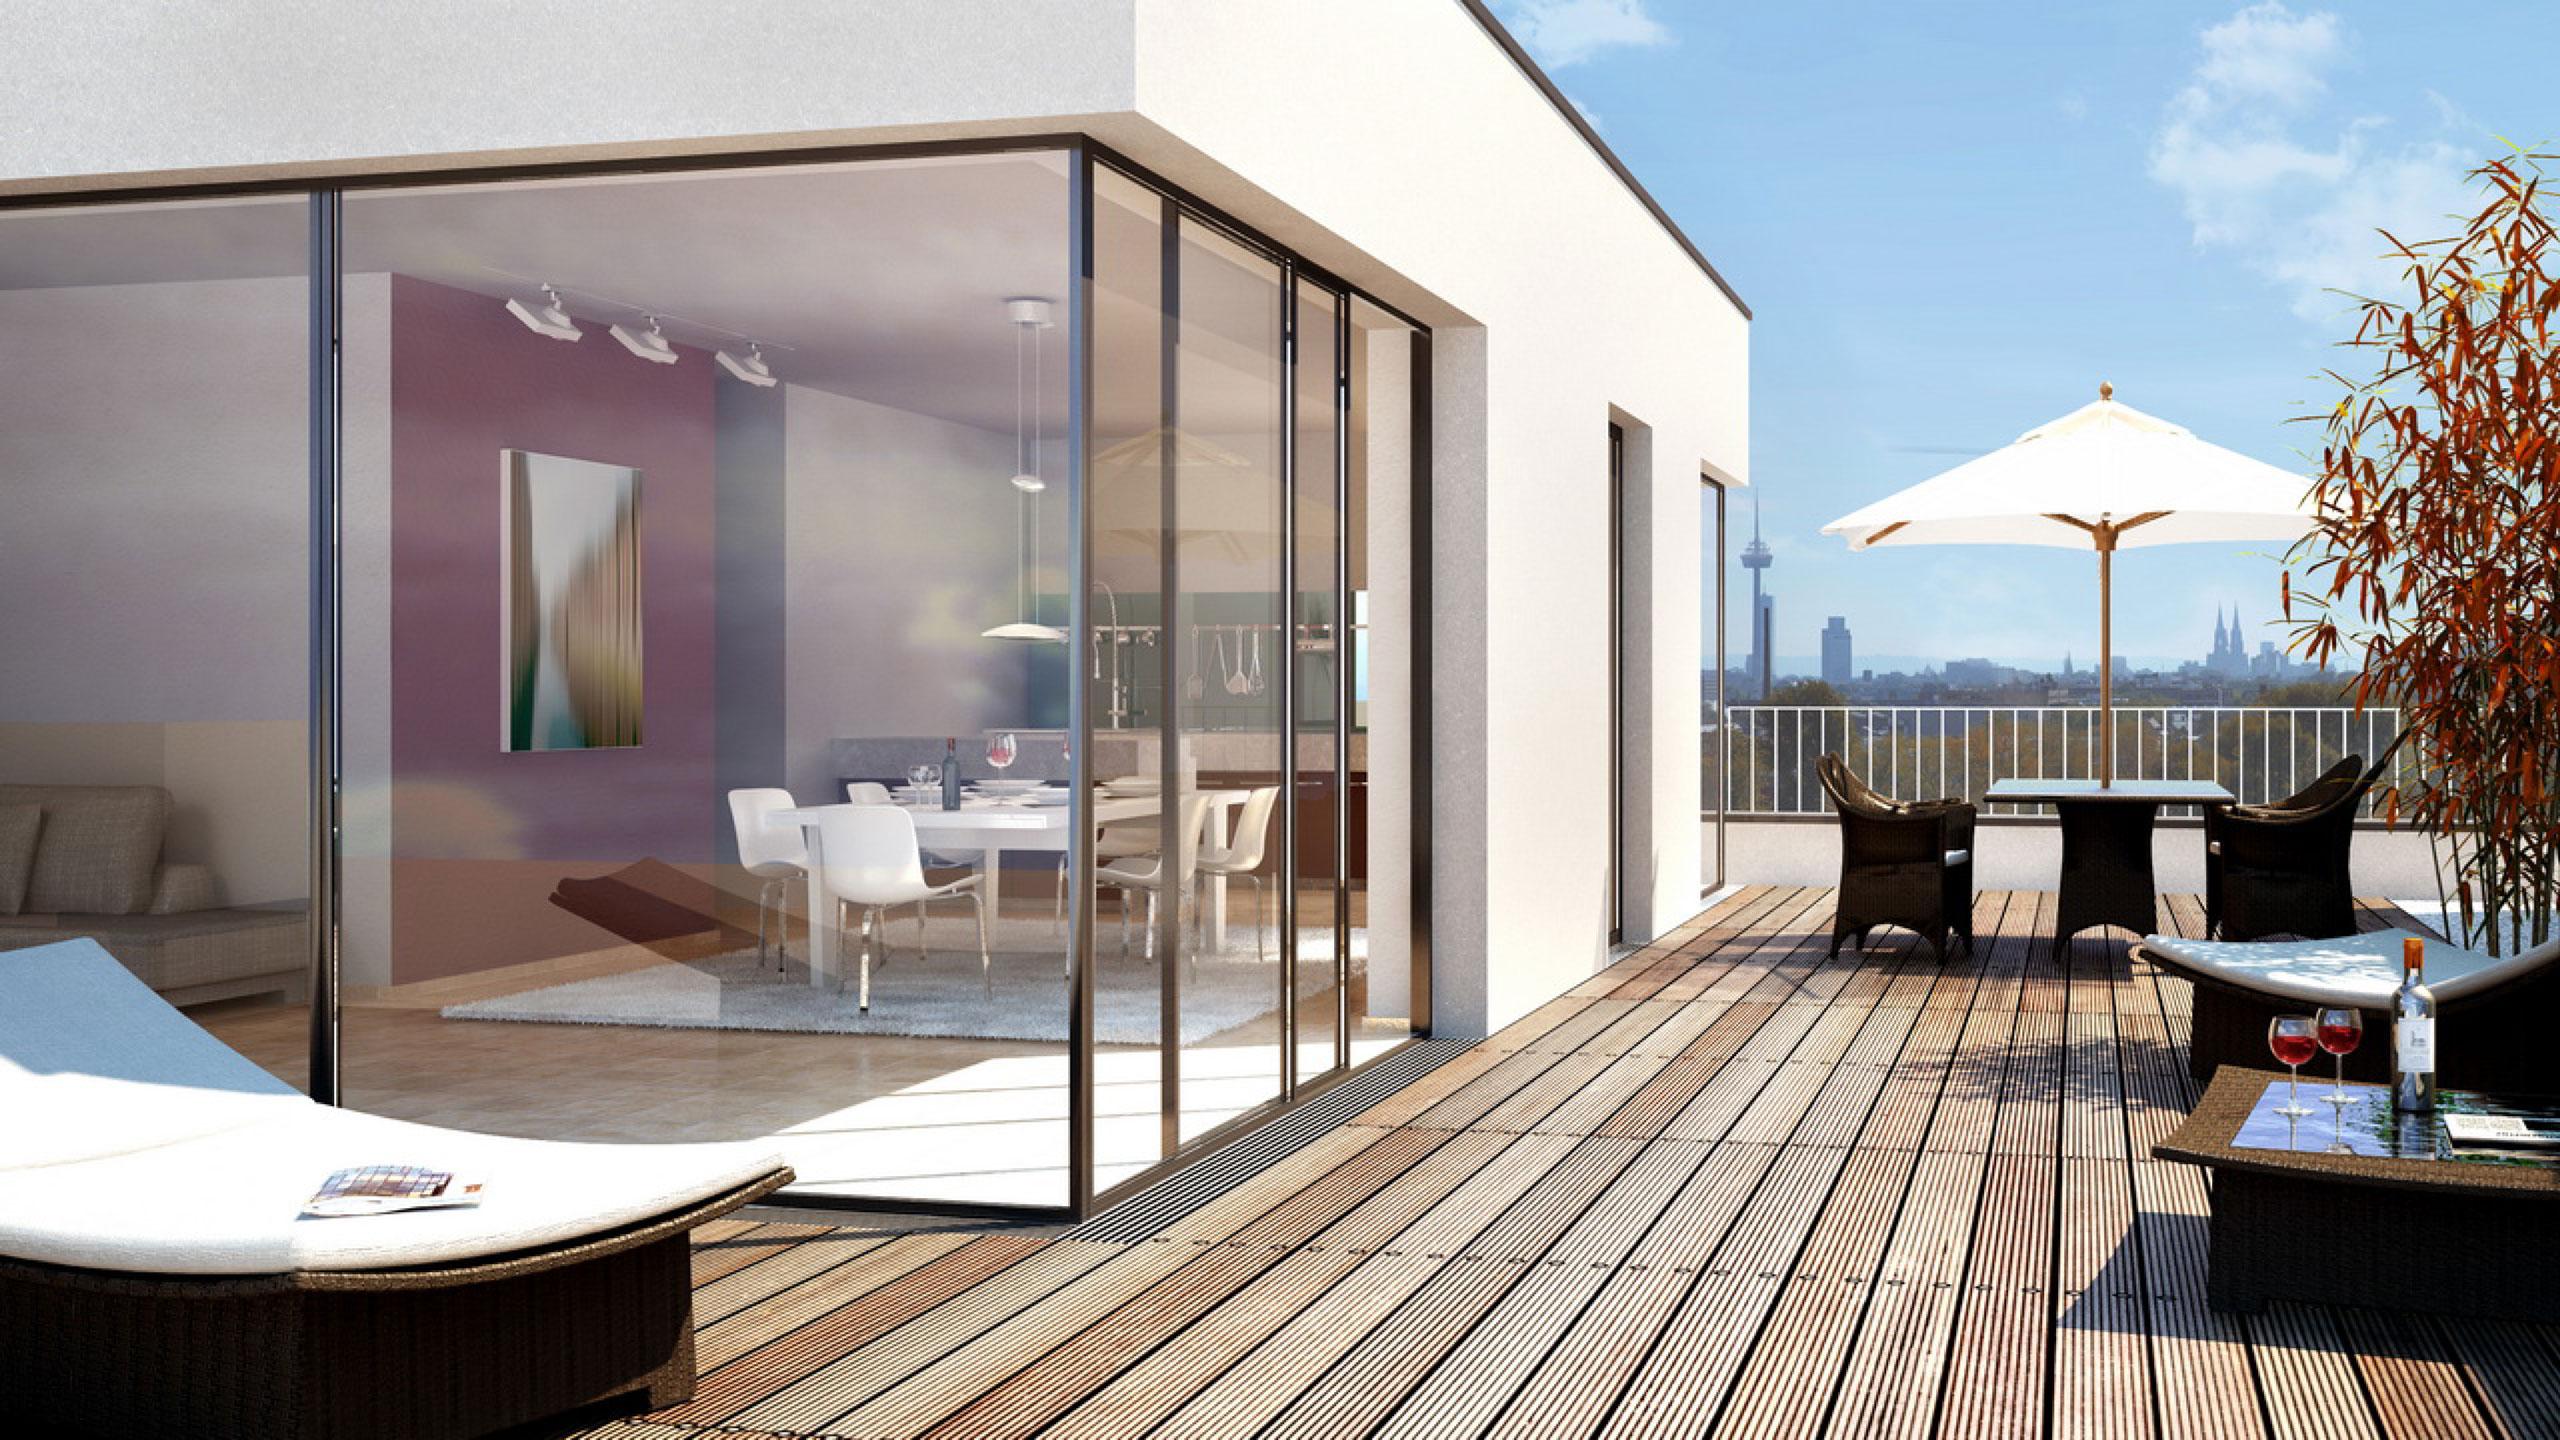 reimann immobilien ihr immobilienmakler im k lner westen. Black Bedroom Furniture Sets. Home Design Ideas